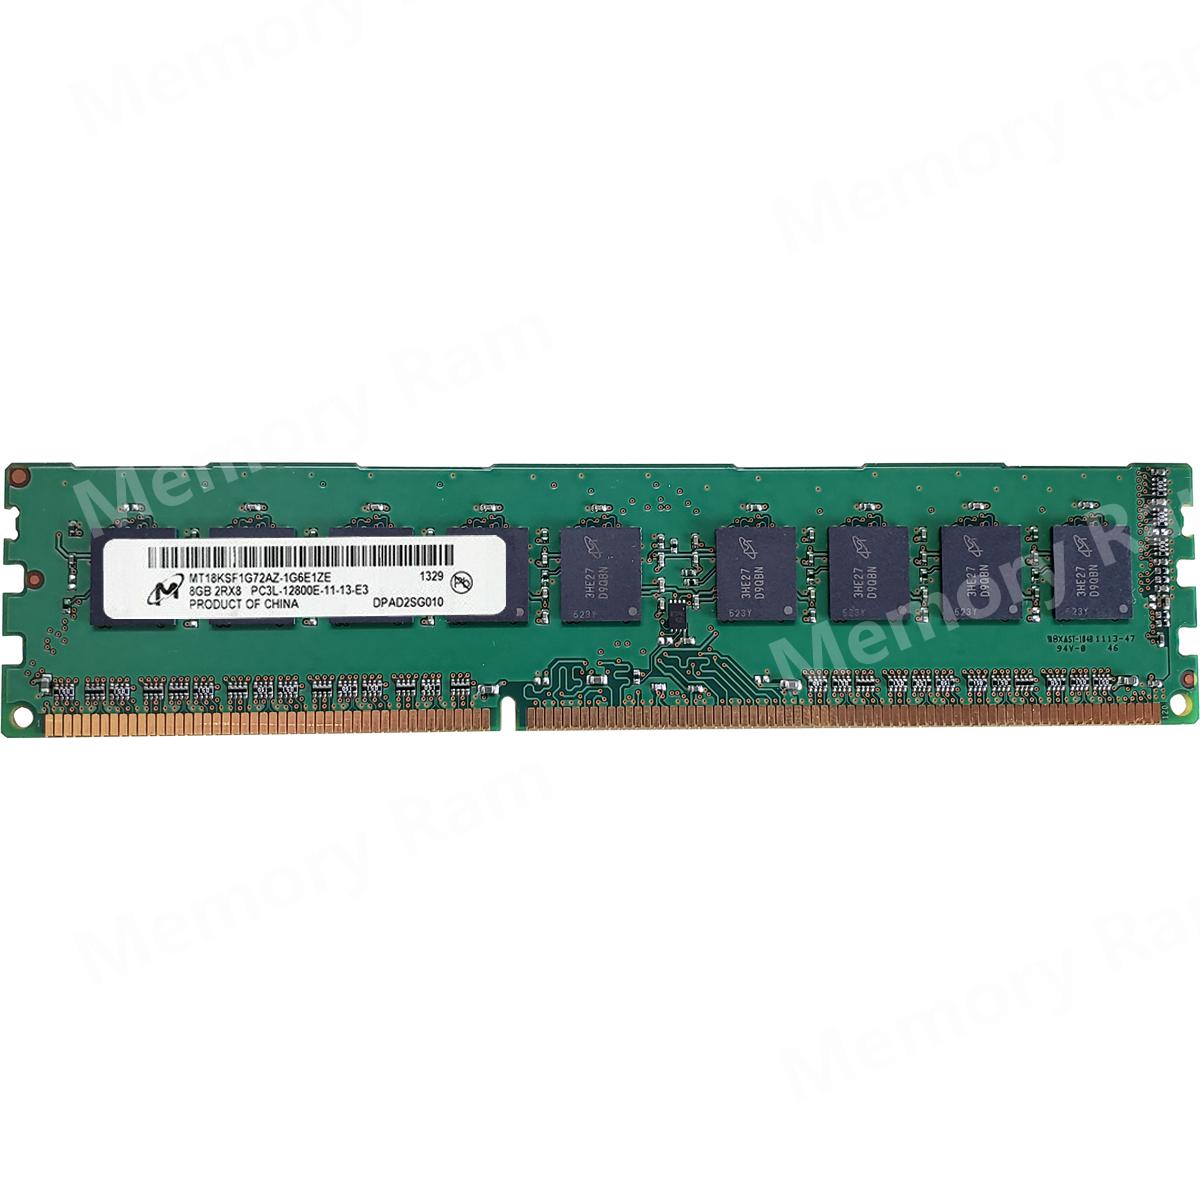 Micron 8GB PC3L-12800E DDR3-1600Mhz 1.35V 240Pin ECC Unbuffered Memory Ram